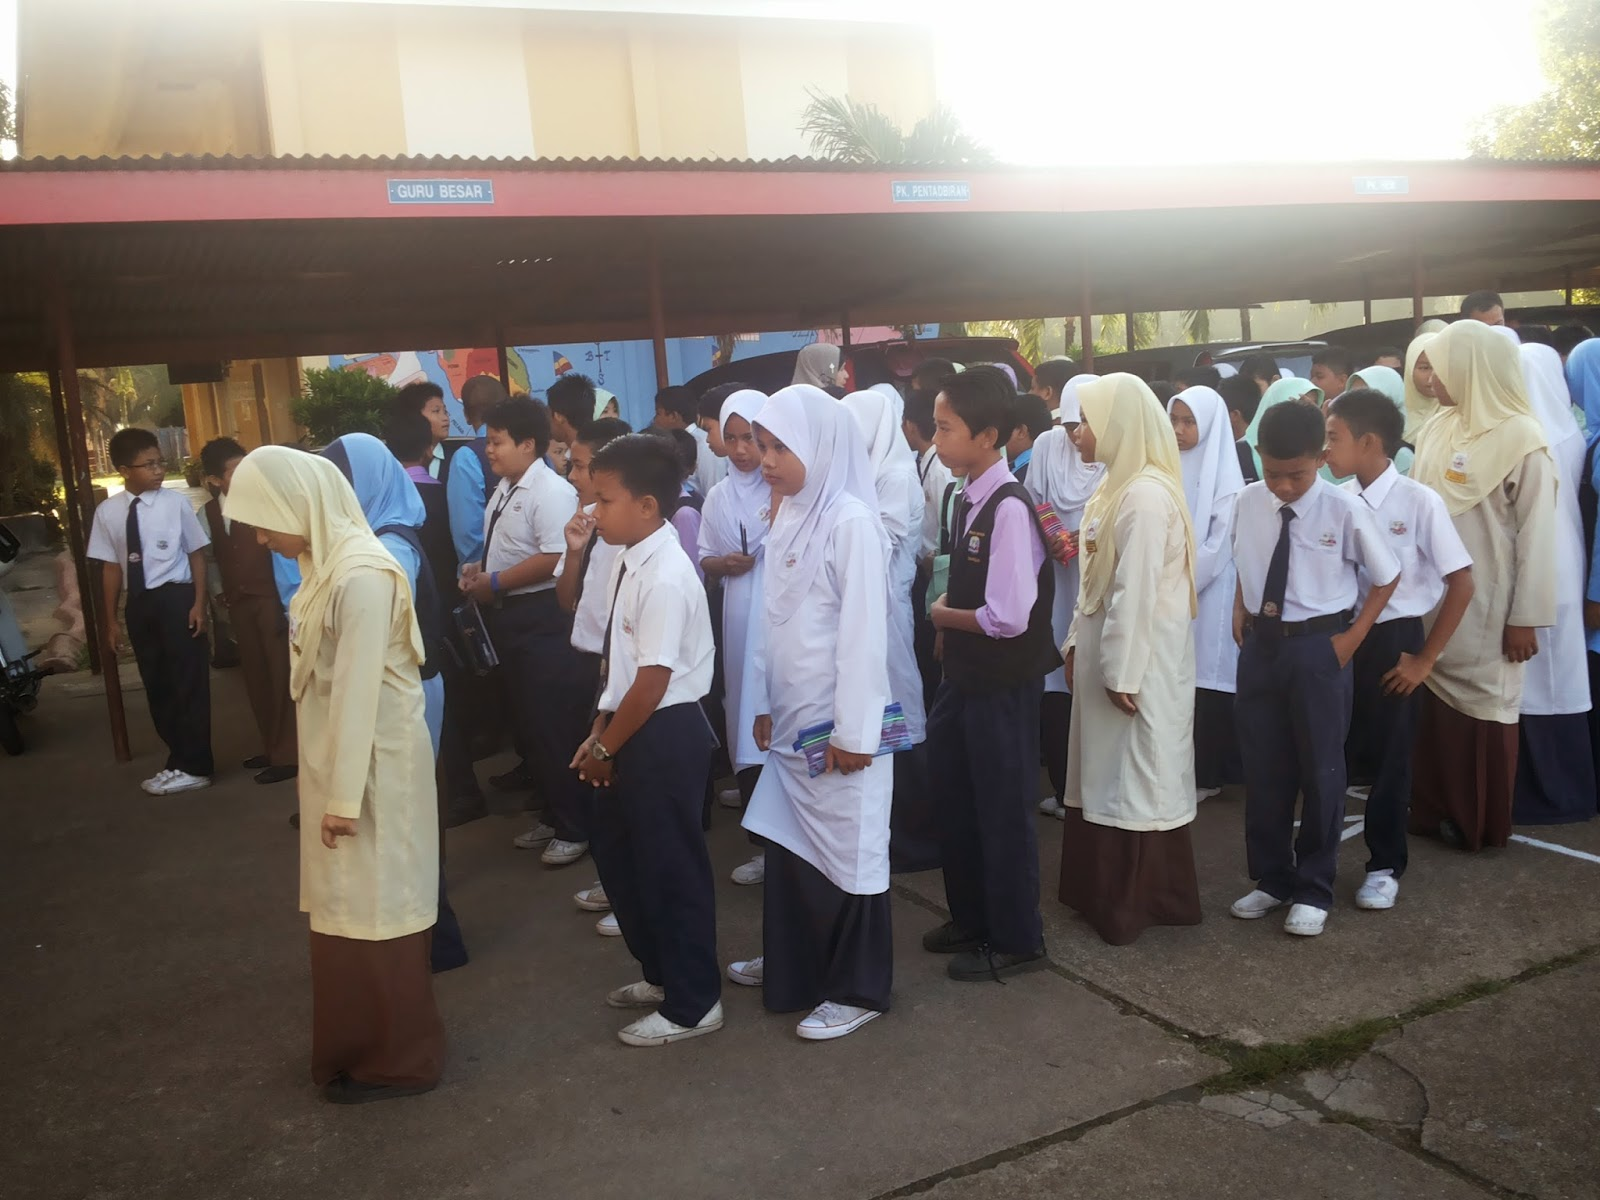 UPSR 2014 Hari Pertama